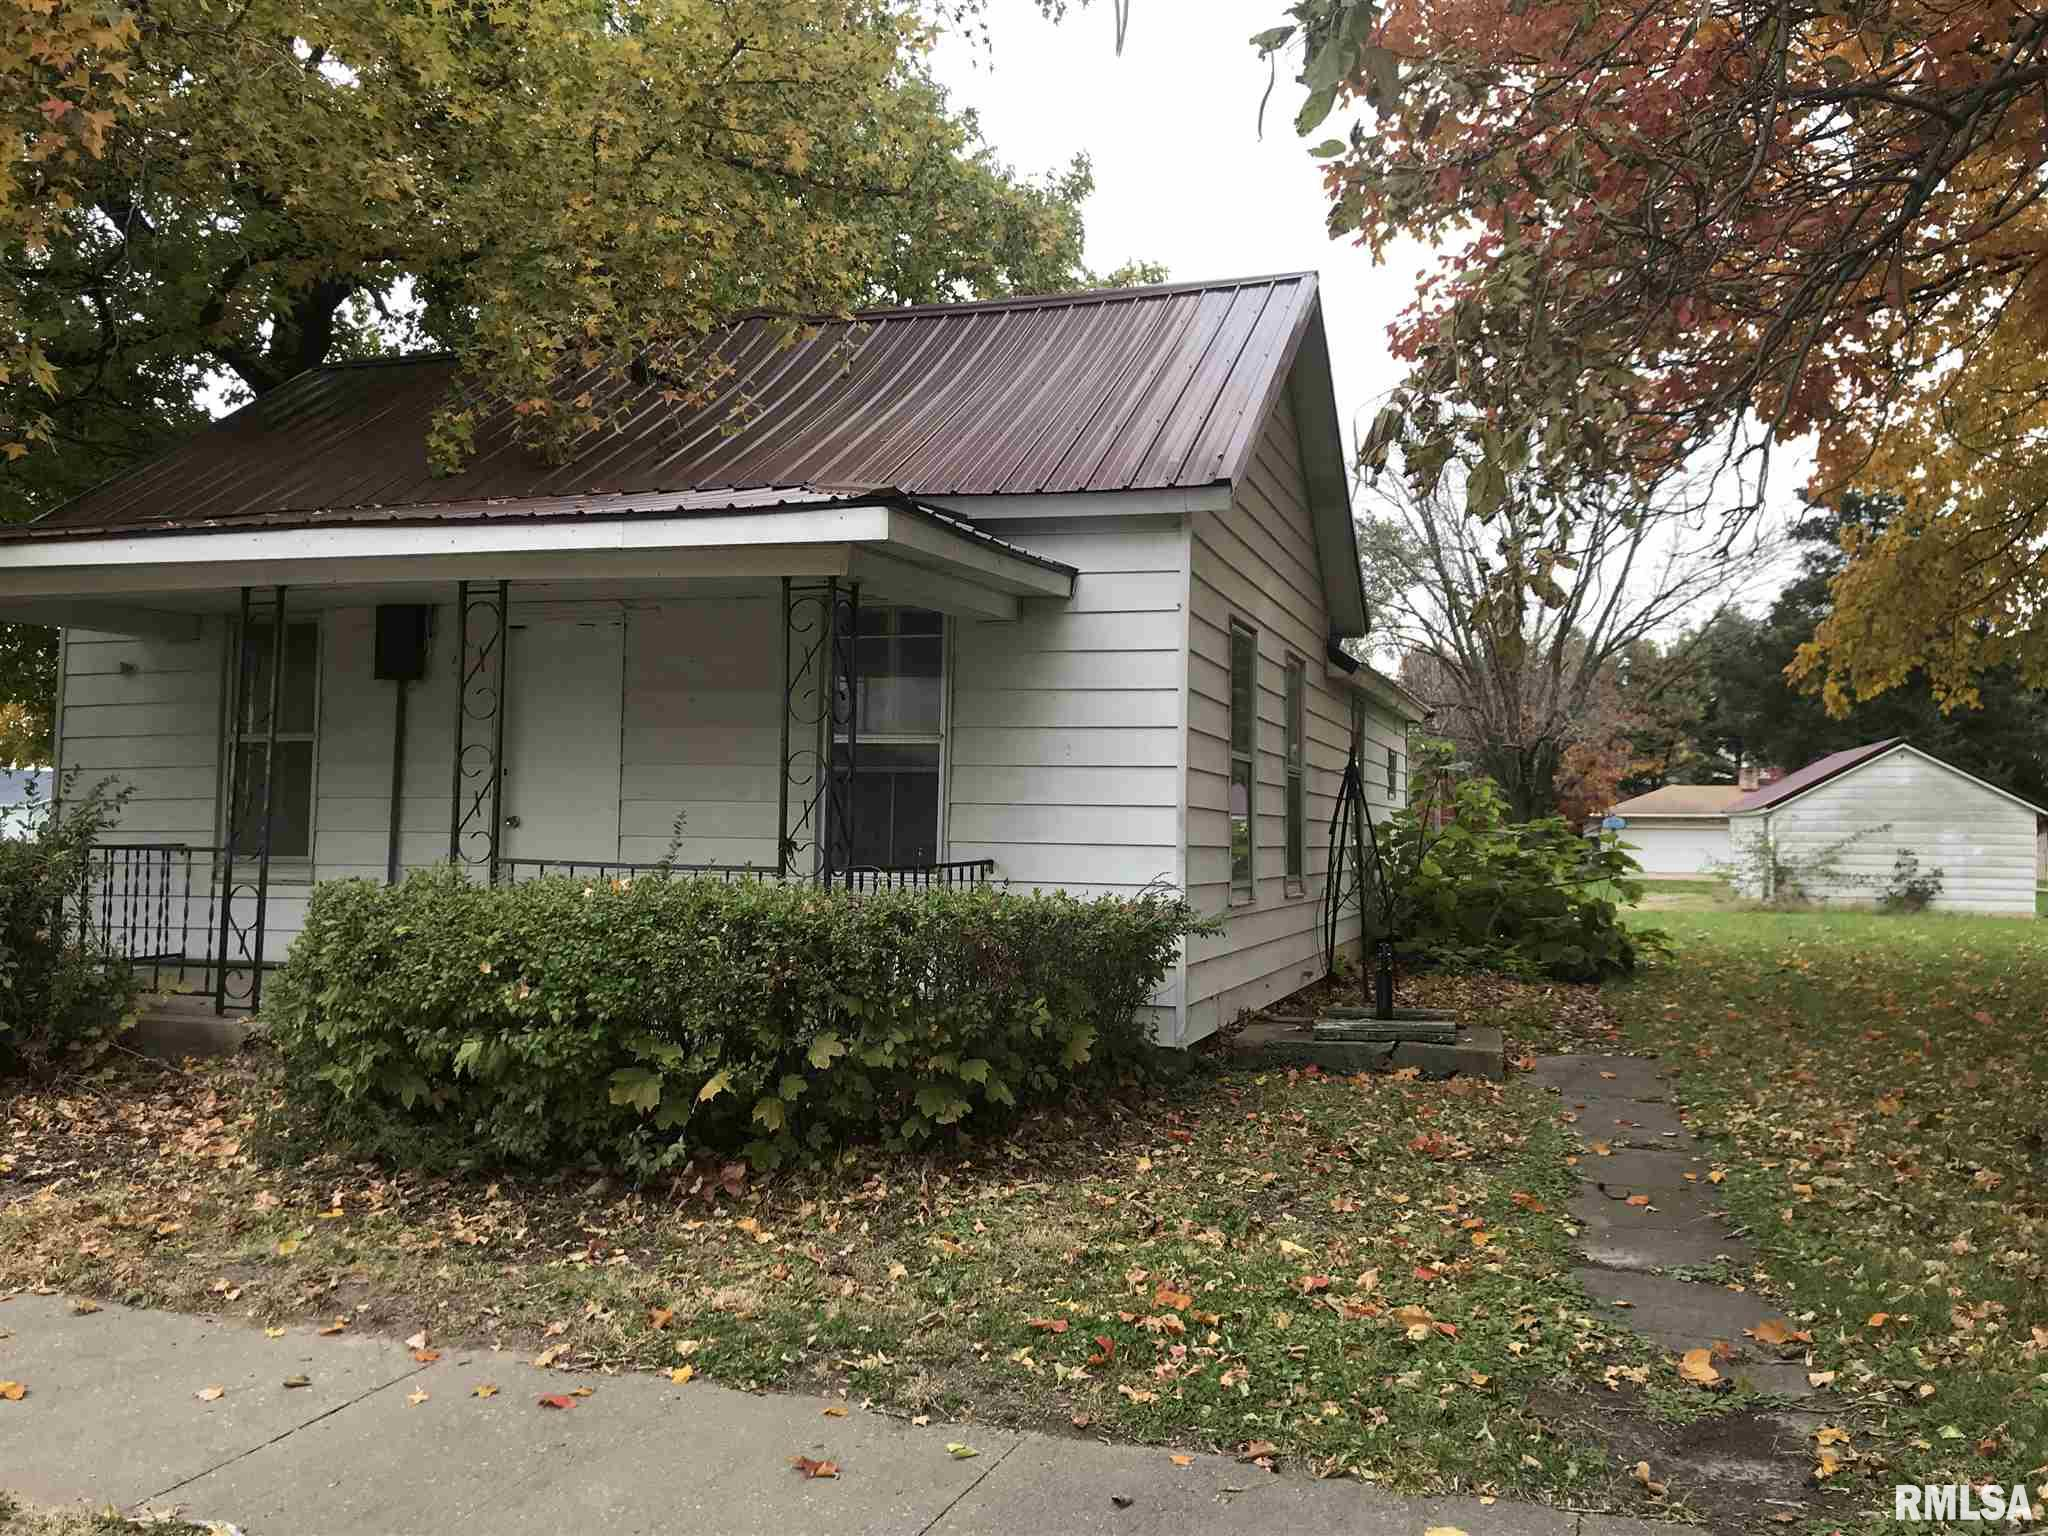 510 W WASHINGTON Property Photo - Blandinsville, IL real estate listing